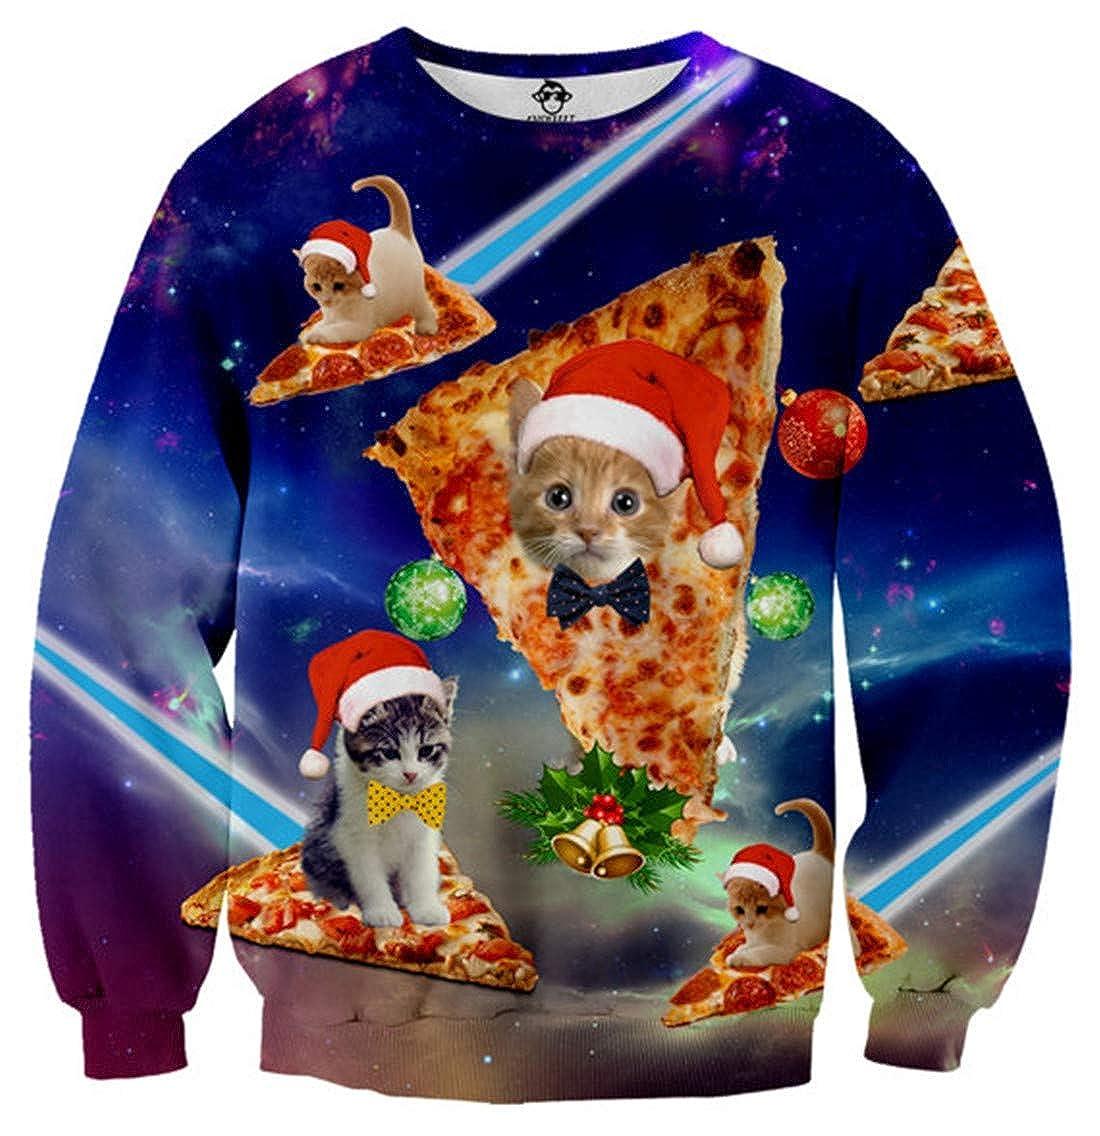 Idgreatim Unsiex Ugly Christmas Pullover Sweatshirts 3D Print Novelty Xmas Elf Long Sleeve Sweater